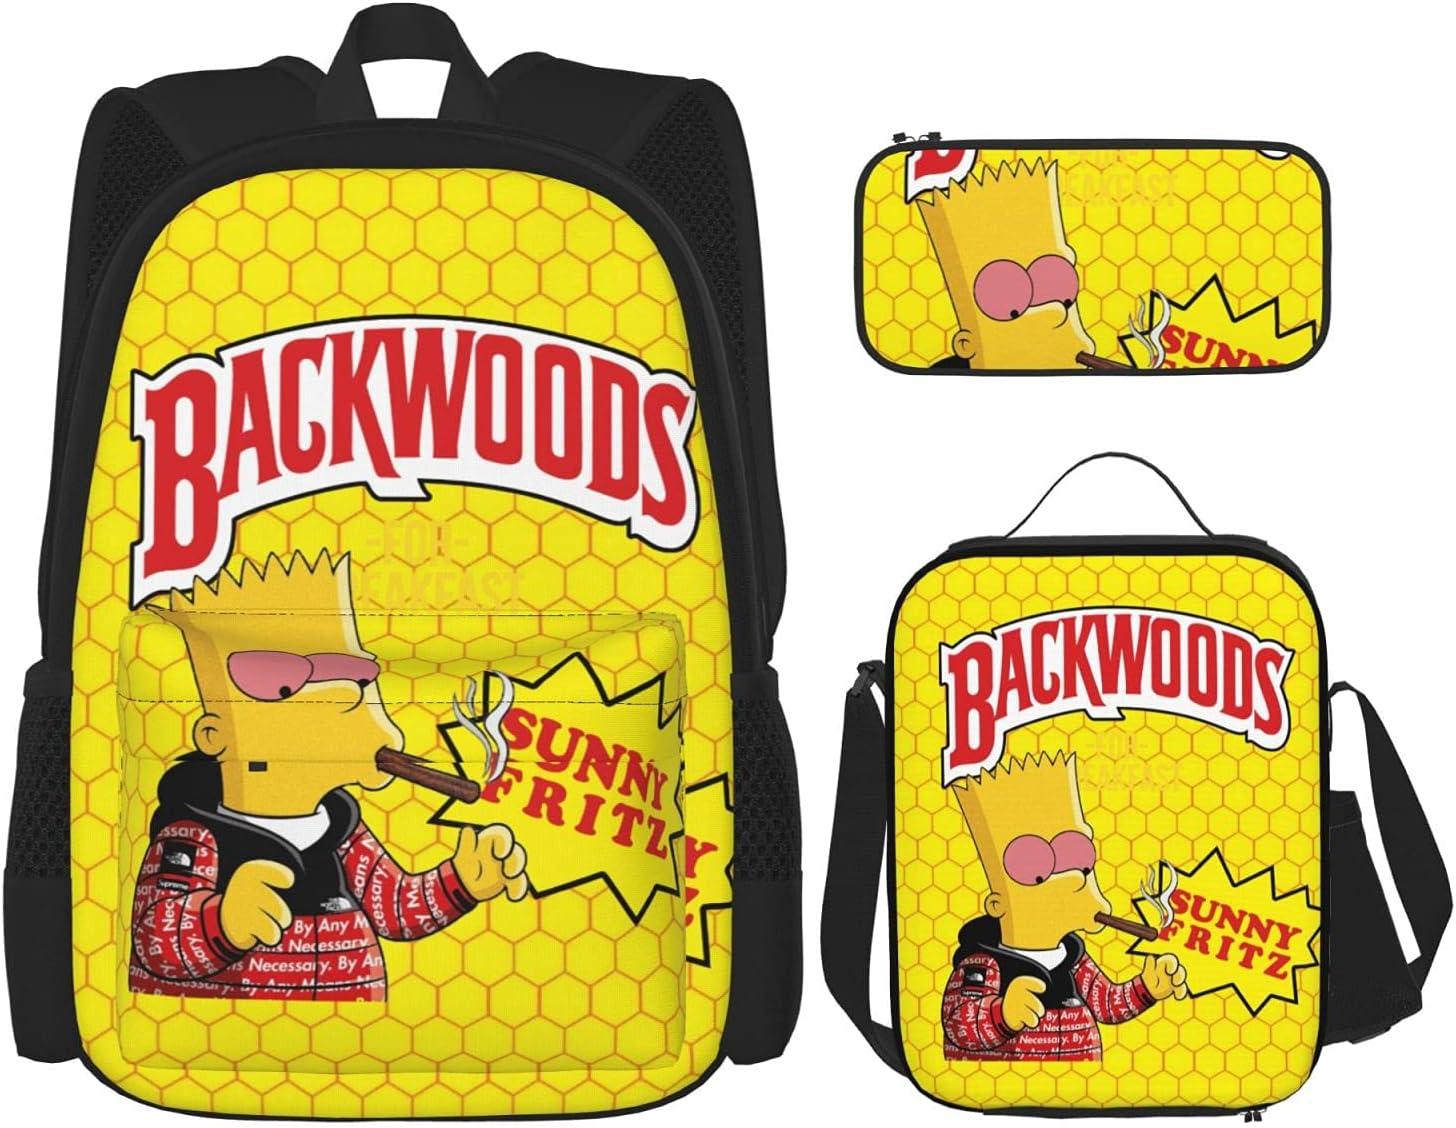 Backwoods Fashion Backpack Messenger Lunch Bag Limited time sale Pencil Same day shipping Set Ba